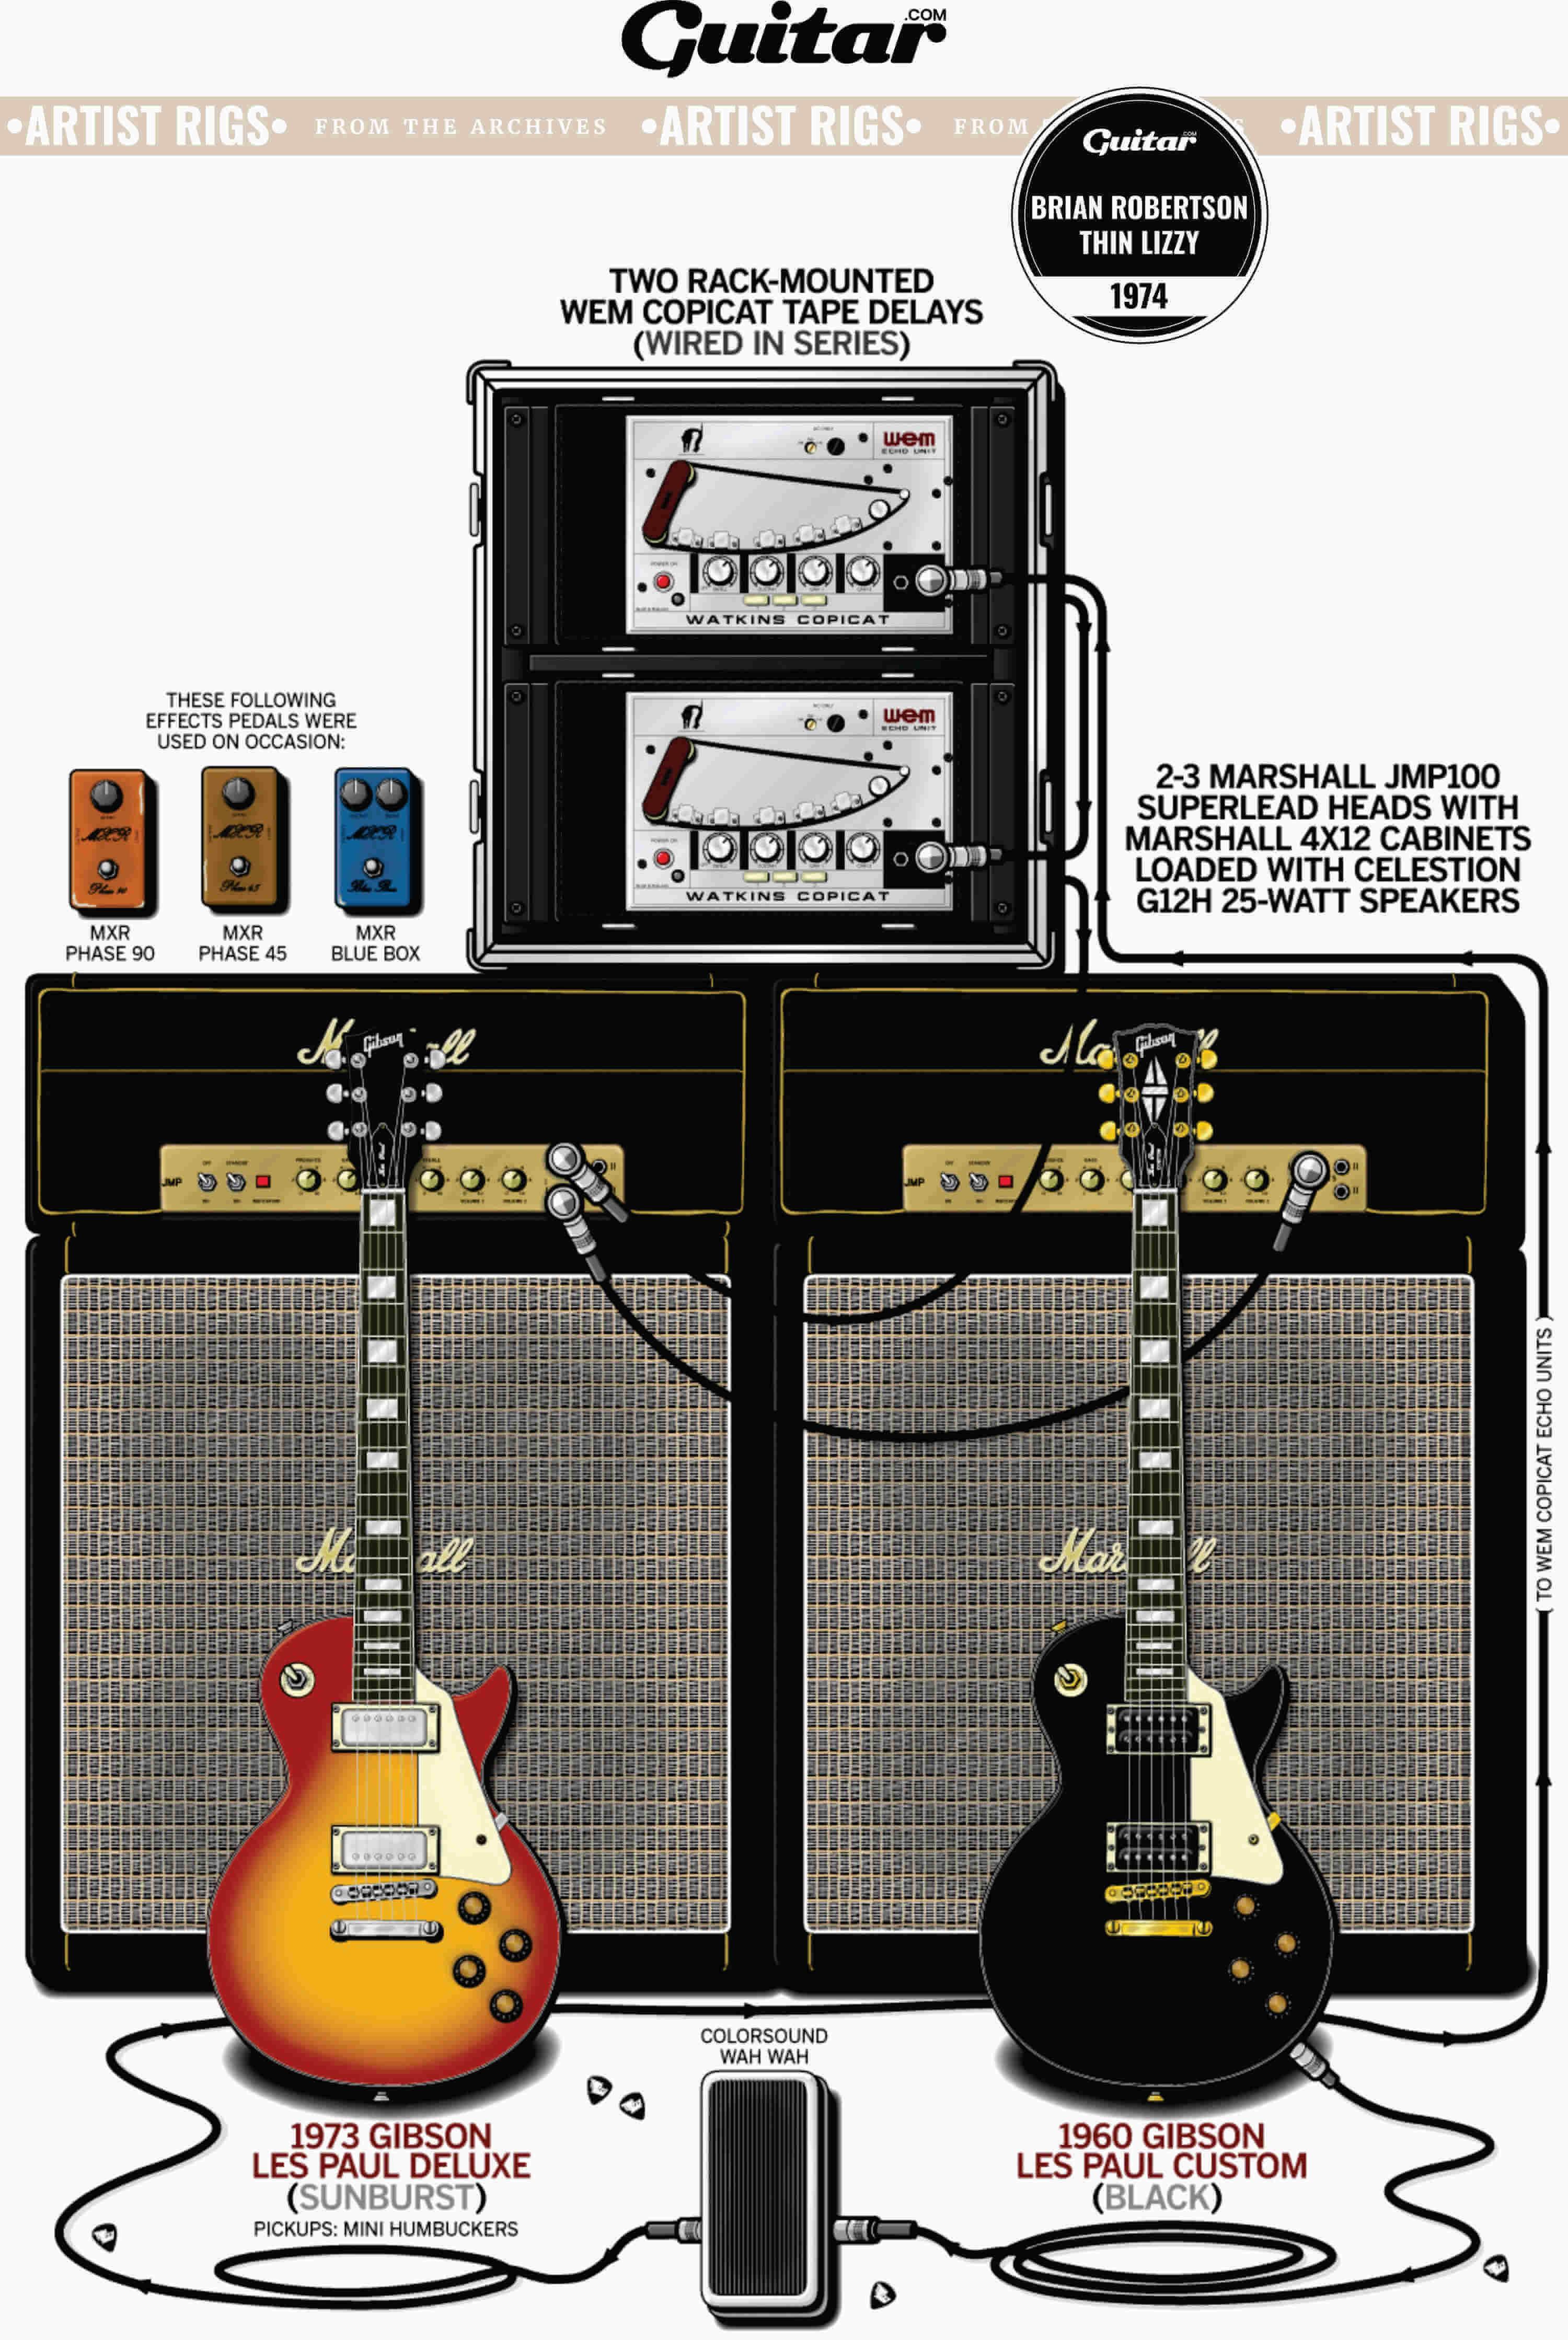 Rig Diagram: Brian Robertson, Thin Lizzy (1974)